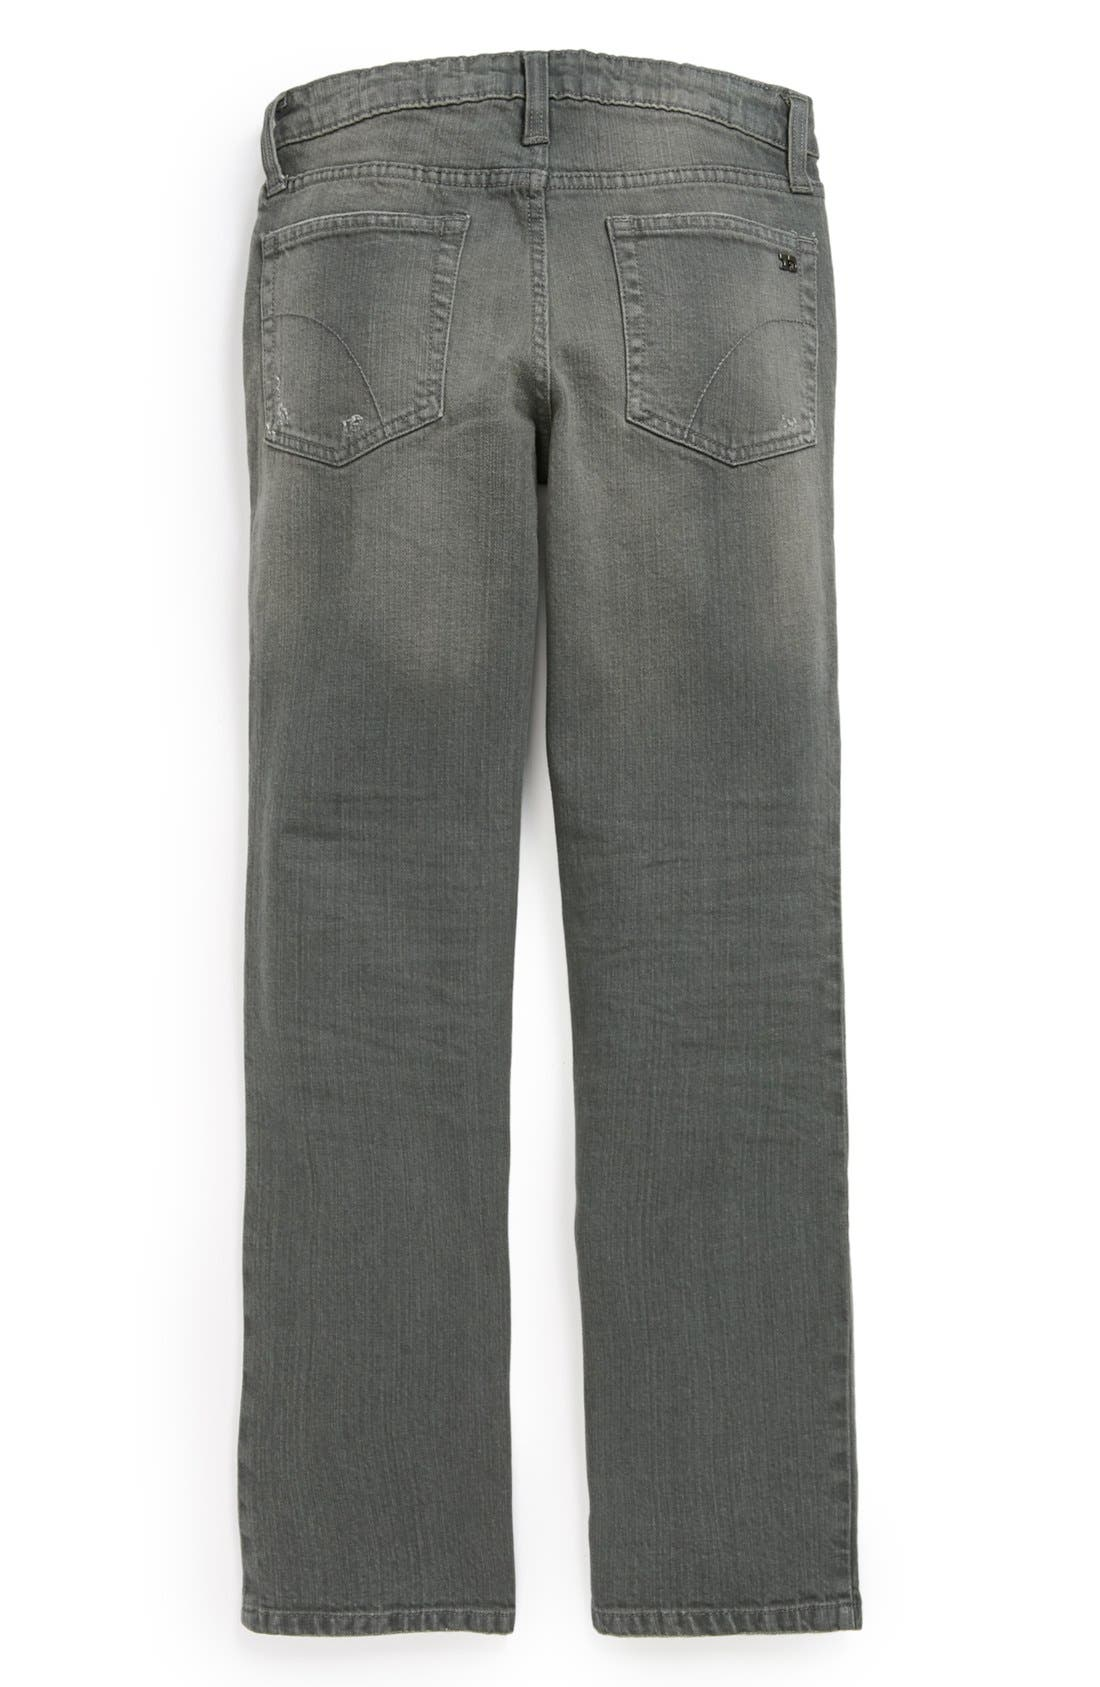 Alternate Image 1 Selected - Joe's 'The Rad' Skinny Fit Jeans (Big Boys & Little Boys)